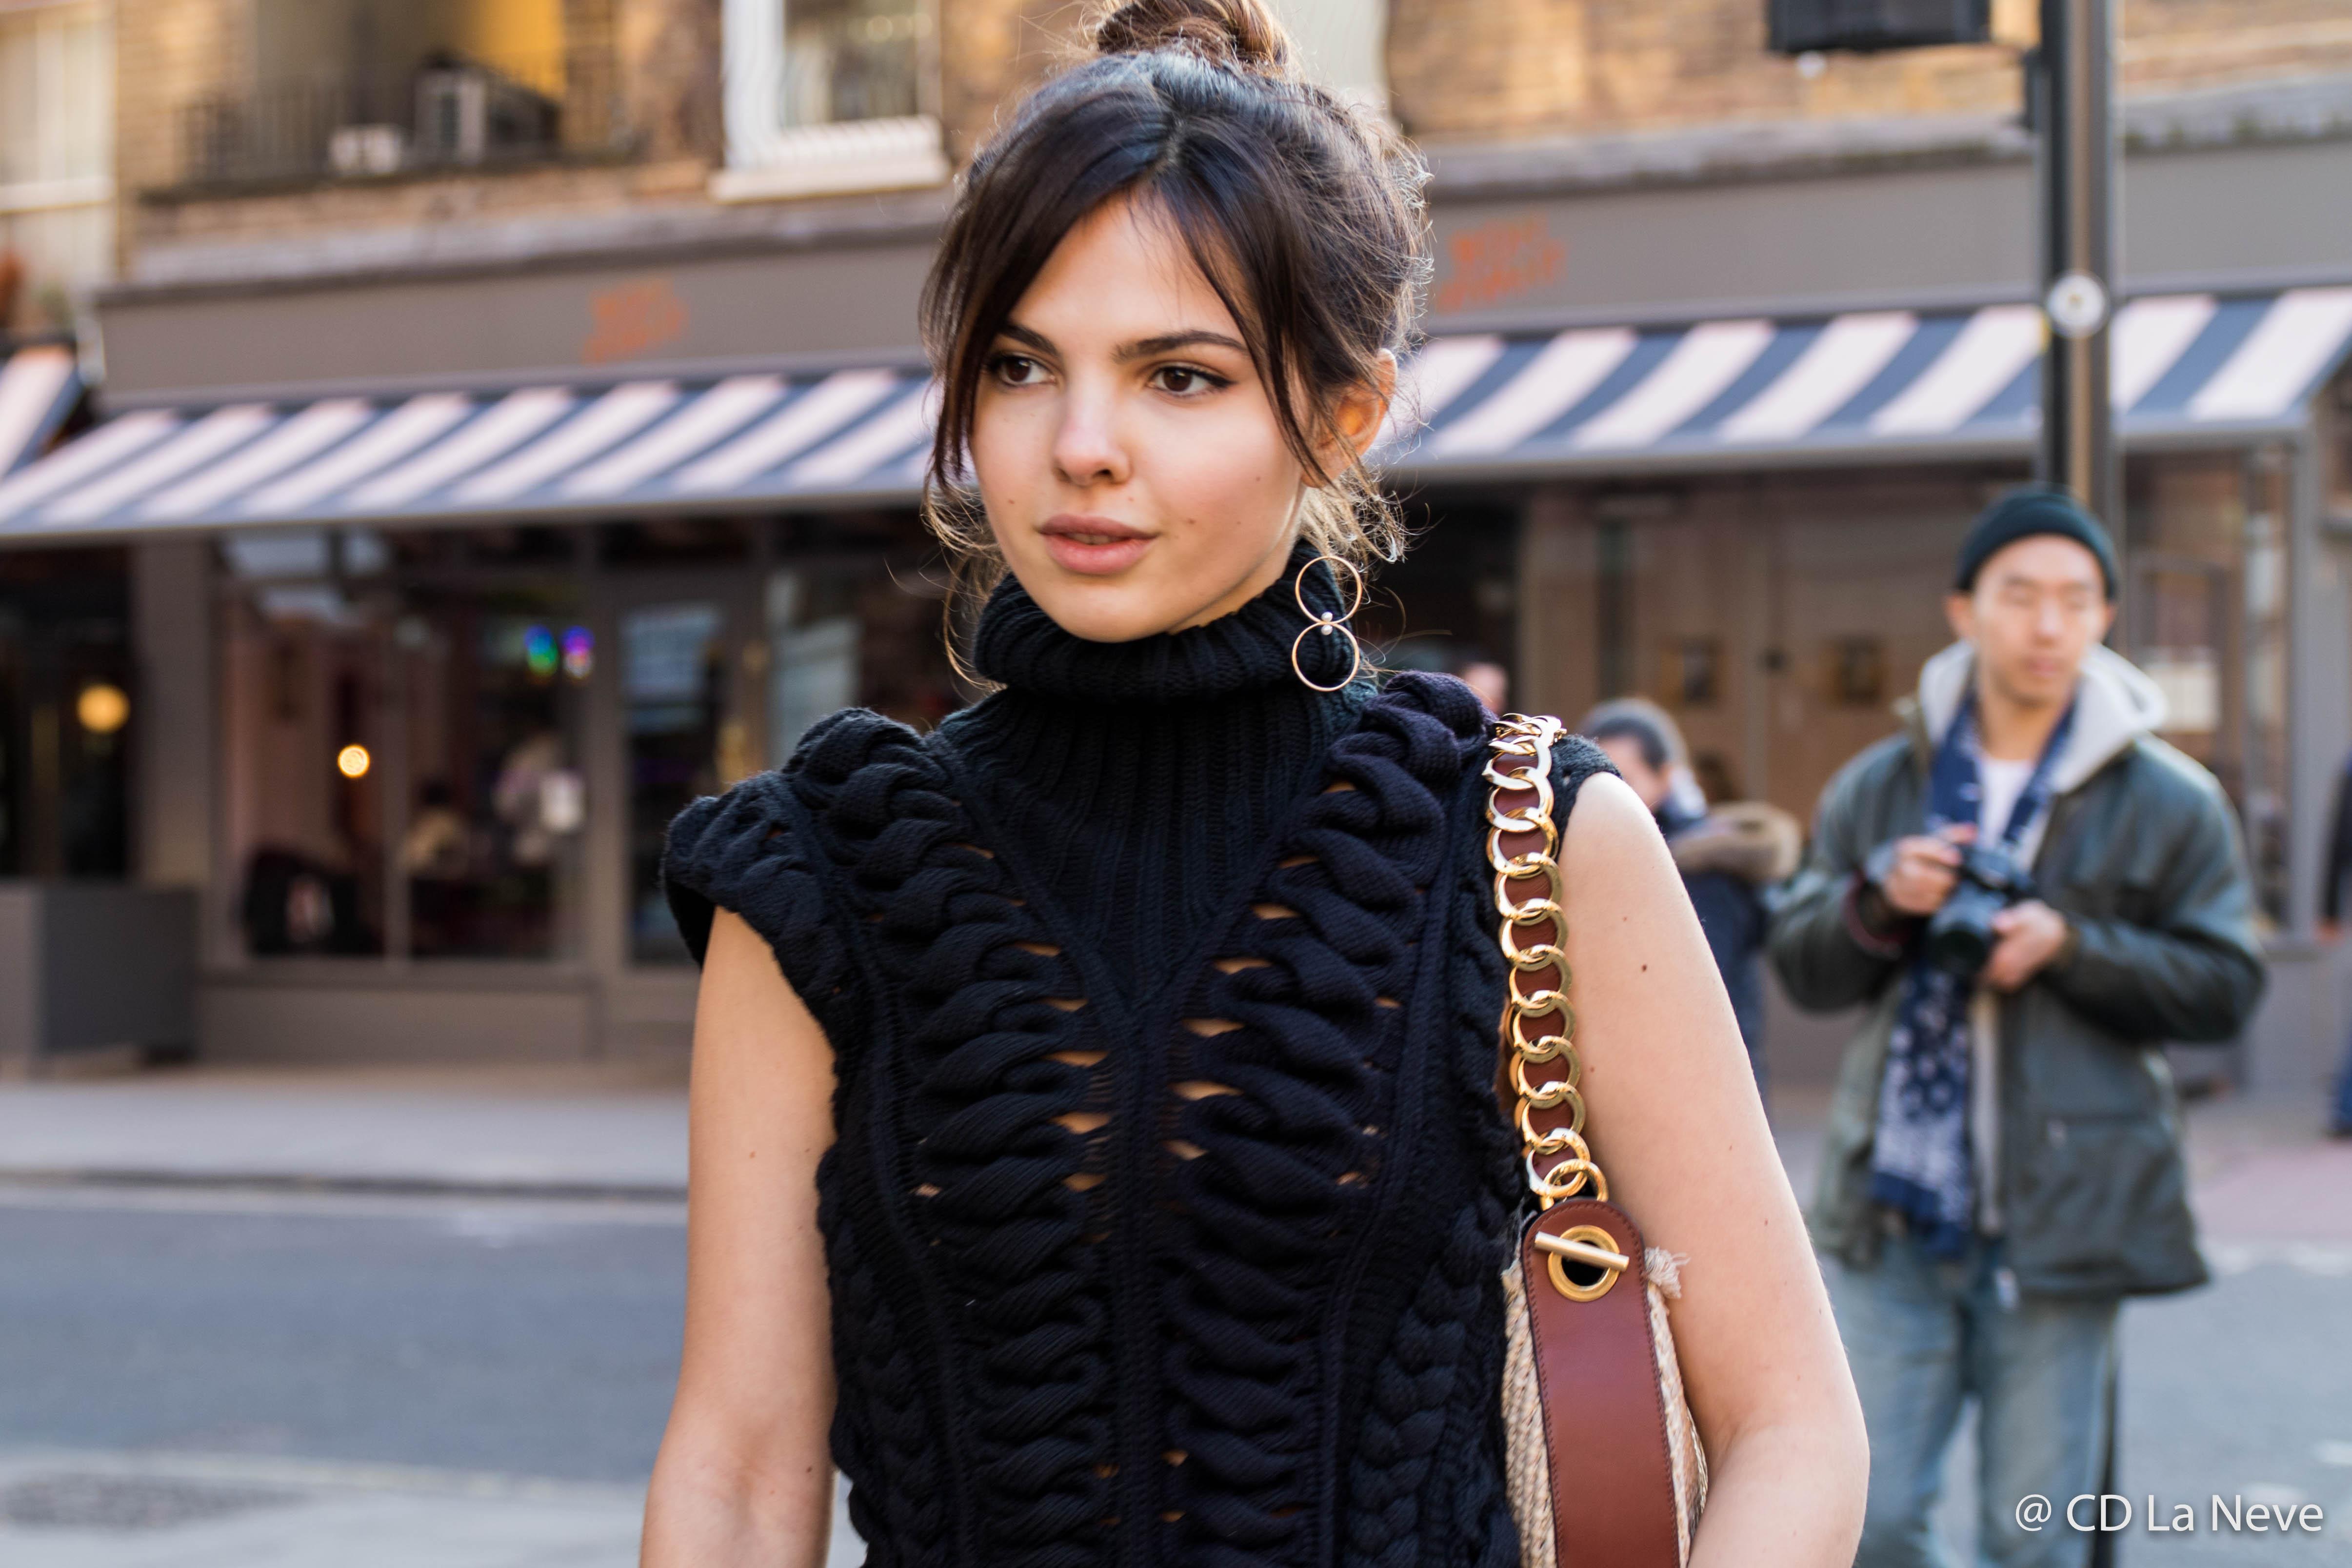 Donia Ciobanu London Fashion Week J.W.Anderson Street Style AW17